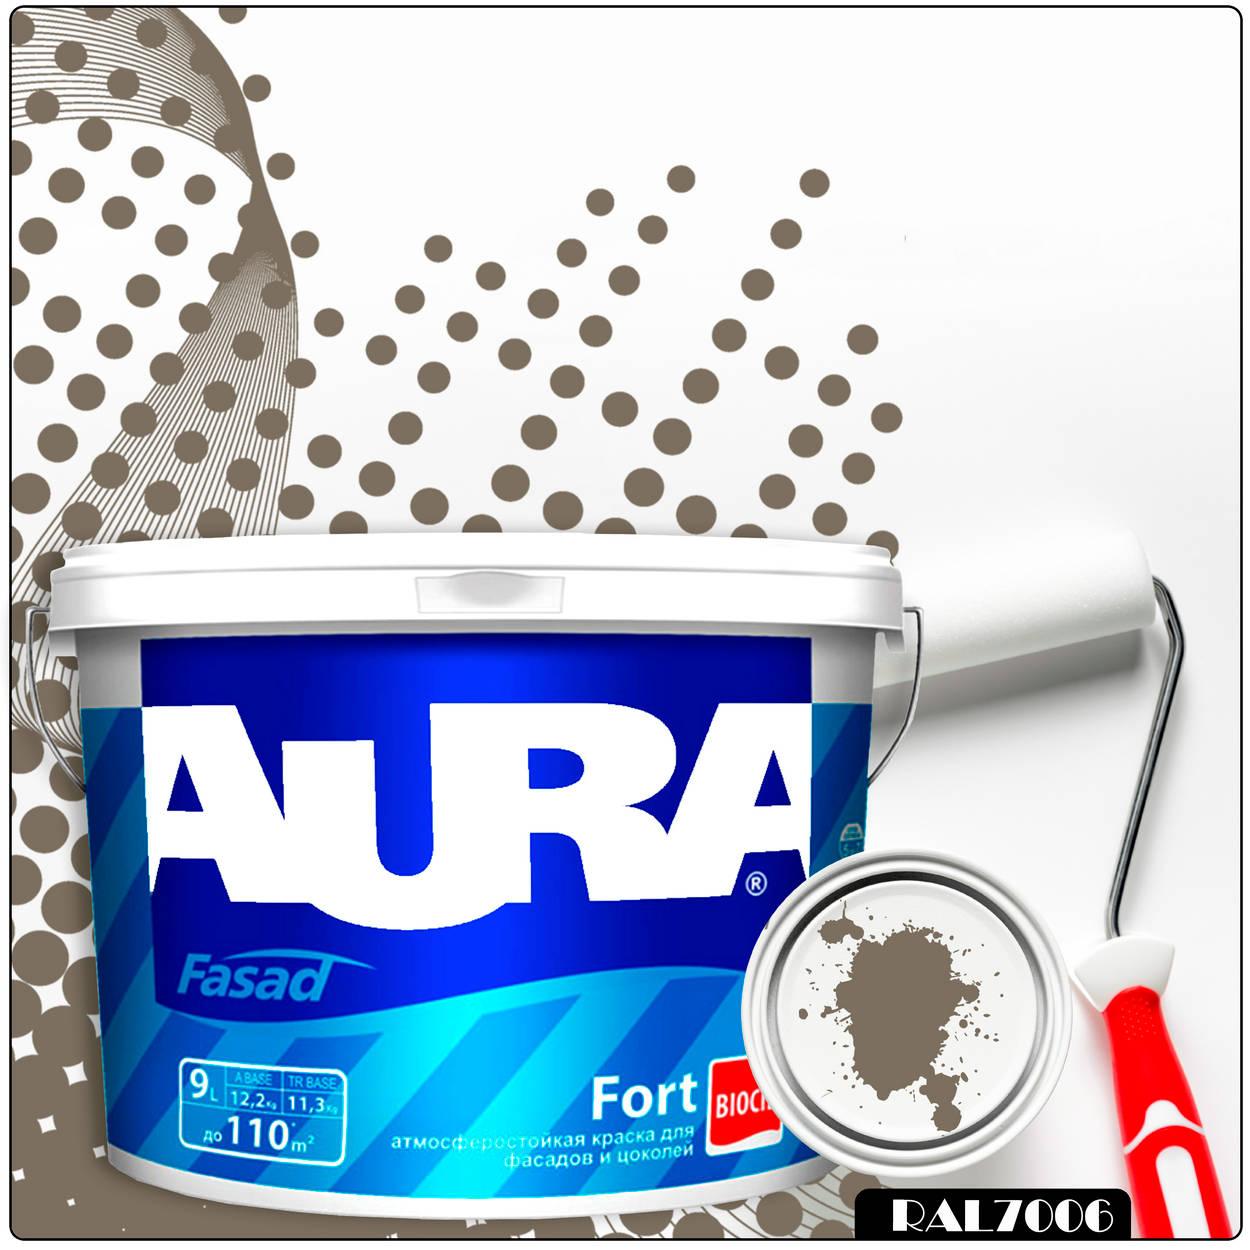 Фото 6 - Краска Aura Fasad Fort, RAL 7006 Бежево-серый, латексная, матовая, для фасада и цоколей, 9л, Аура.